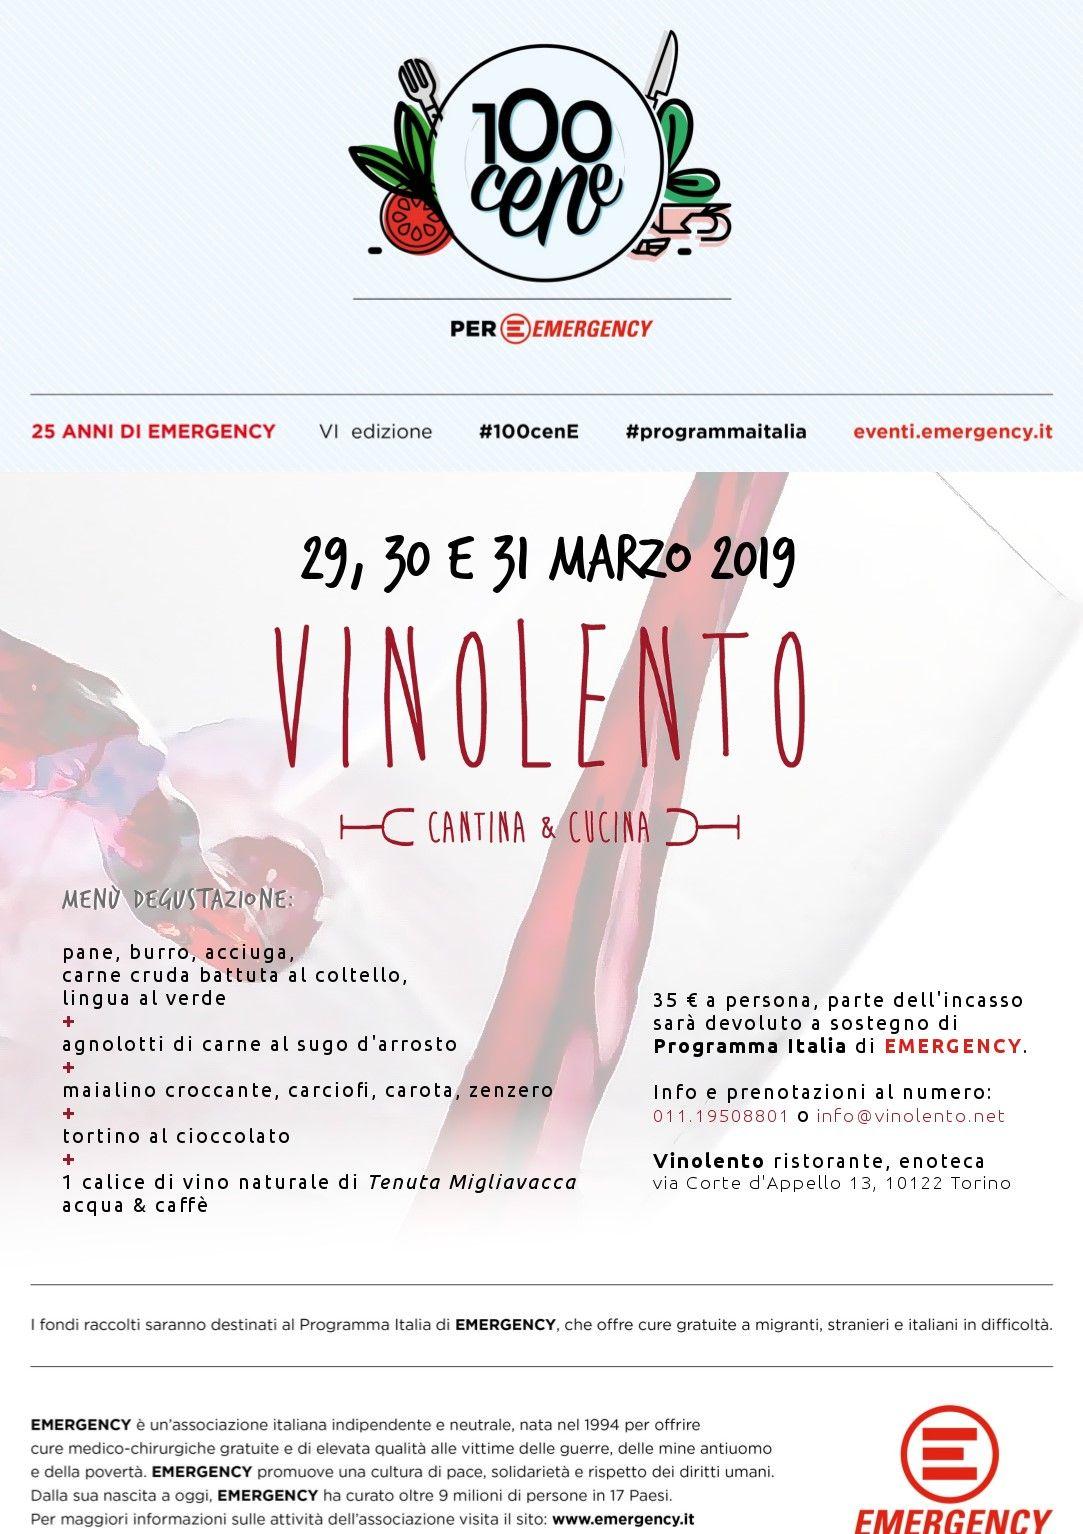 SOLIDARIETA' - Emergency Canavese aderisce all'iniziativa #100cene